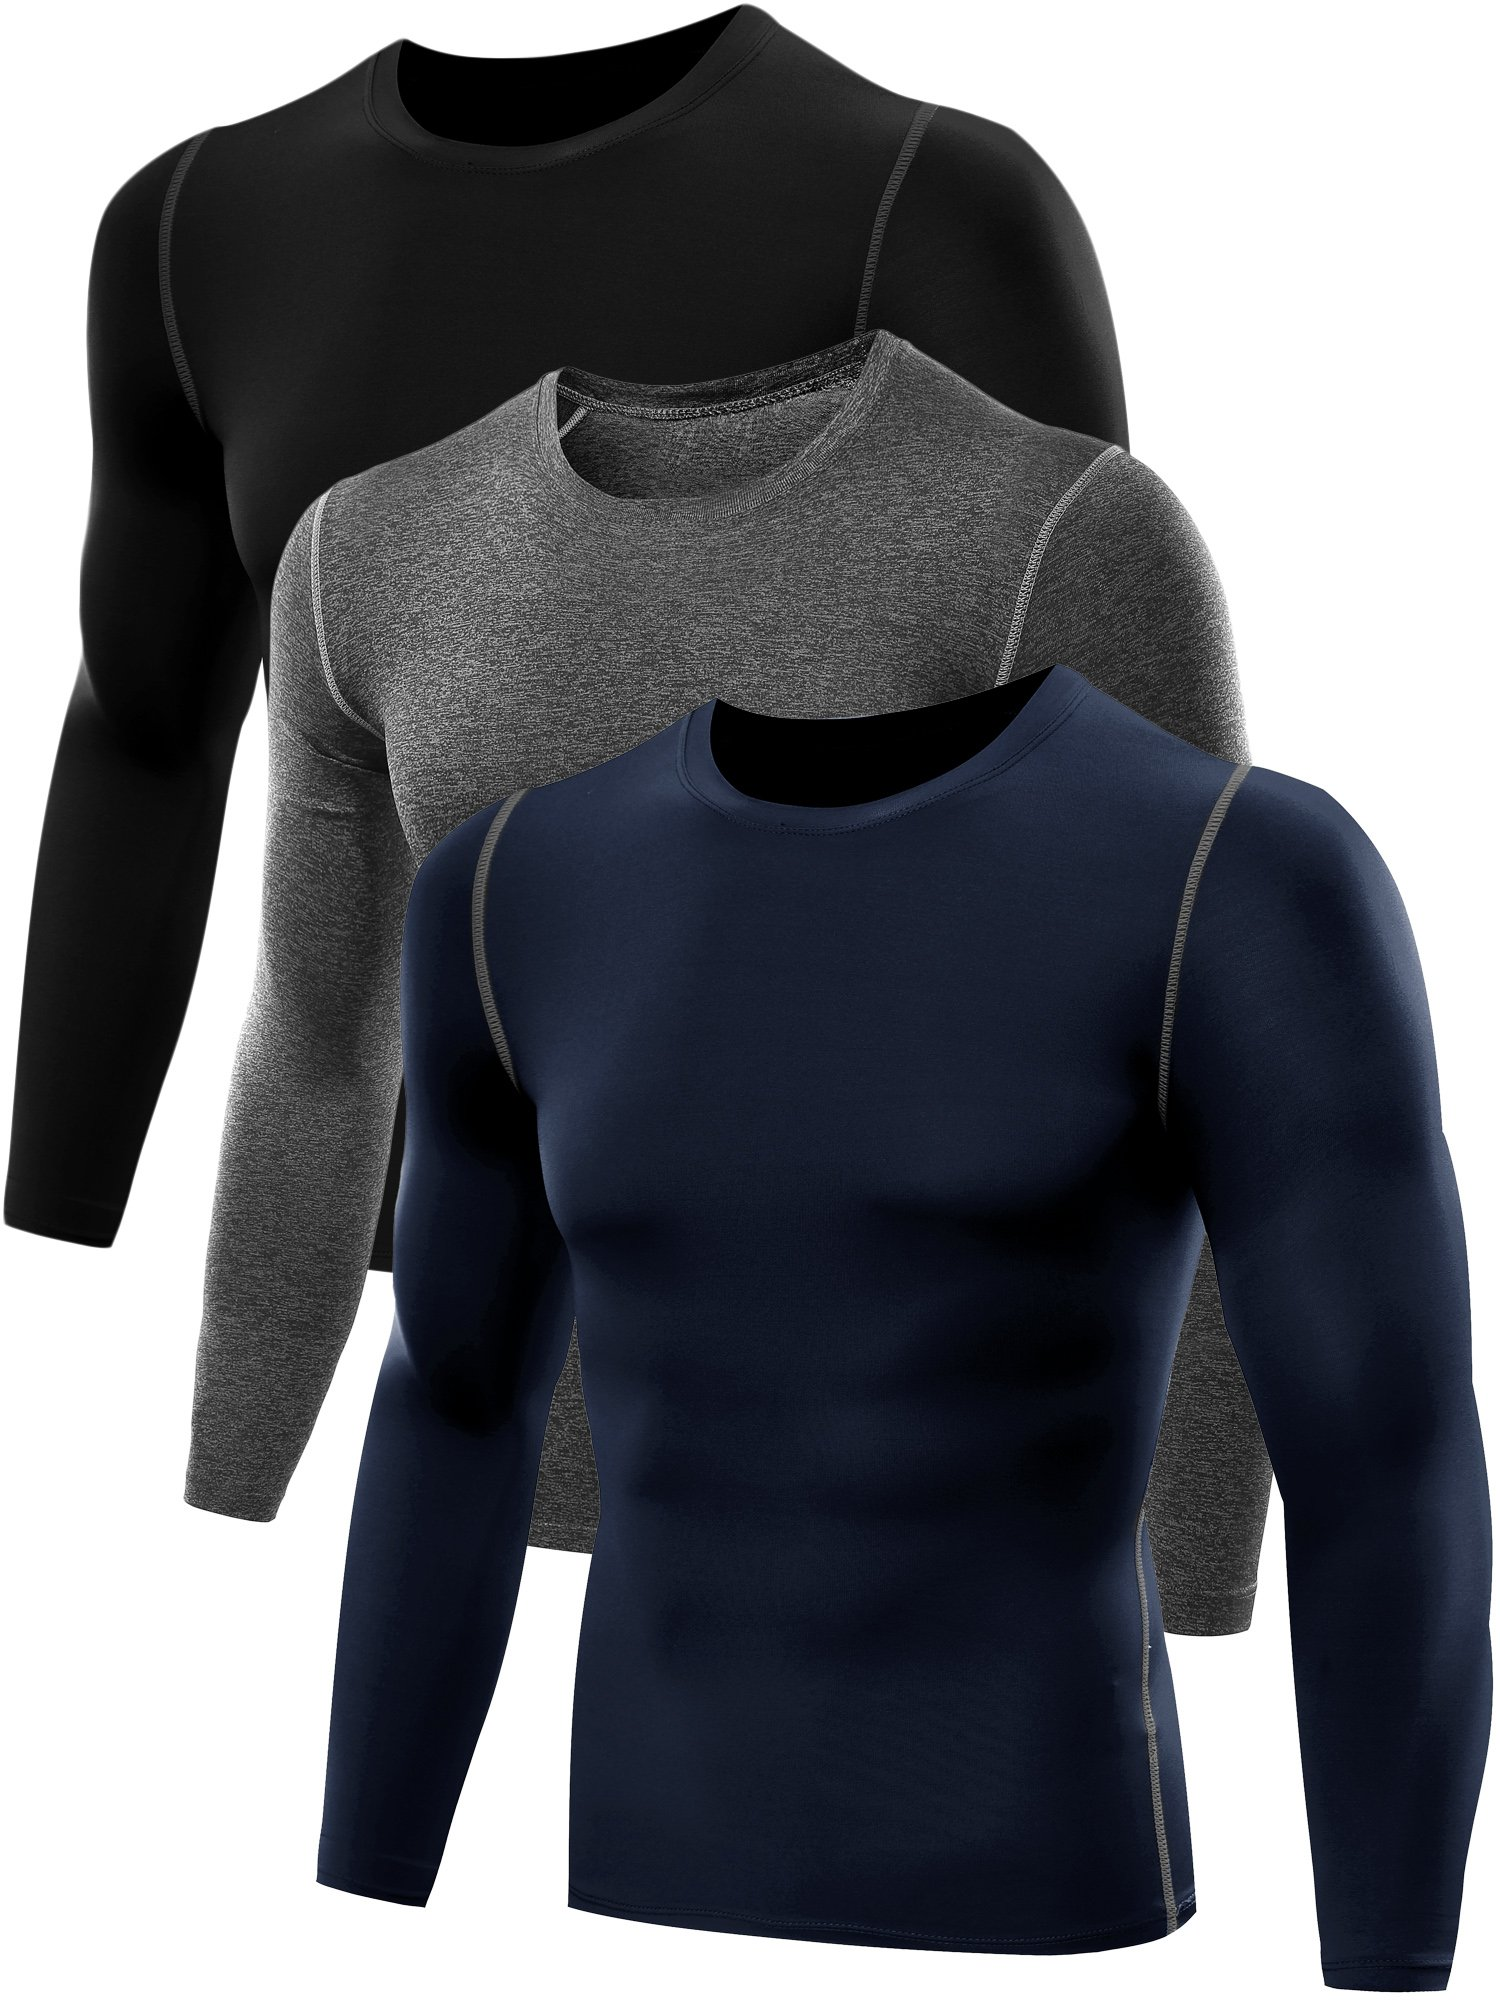 Neleus Men's 3 Pack Athletic Compression Long Sleeve Shirt,008,Black,Grey,Navy Blue,US 2XL,EU 3XL by Neleus